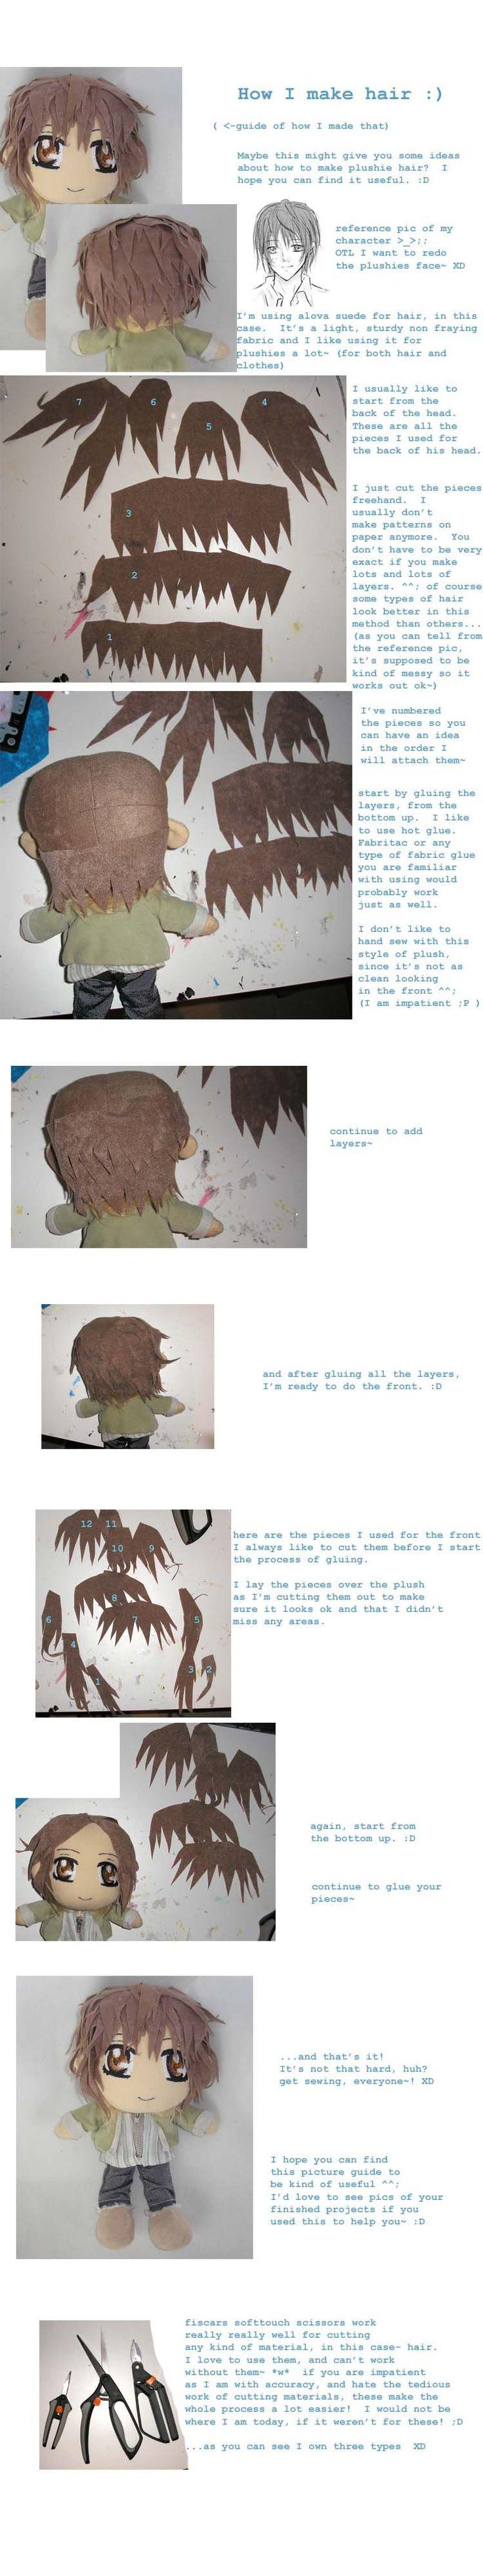 Plushie hair guide pt. 1 by ichigo-pan43.deviantart.com on @DeviantArt